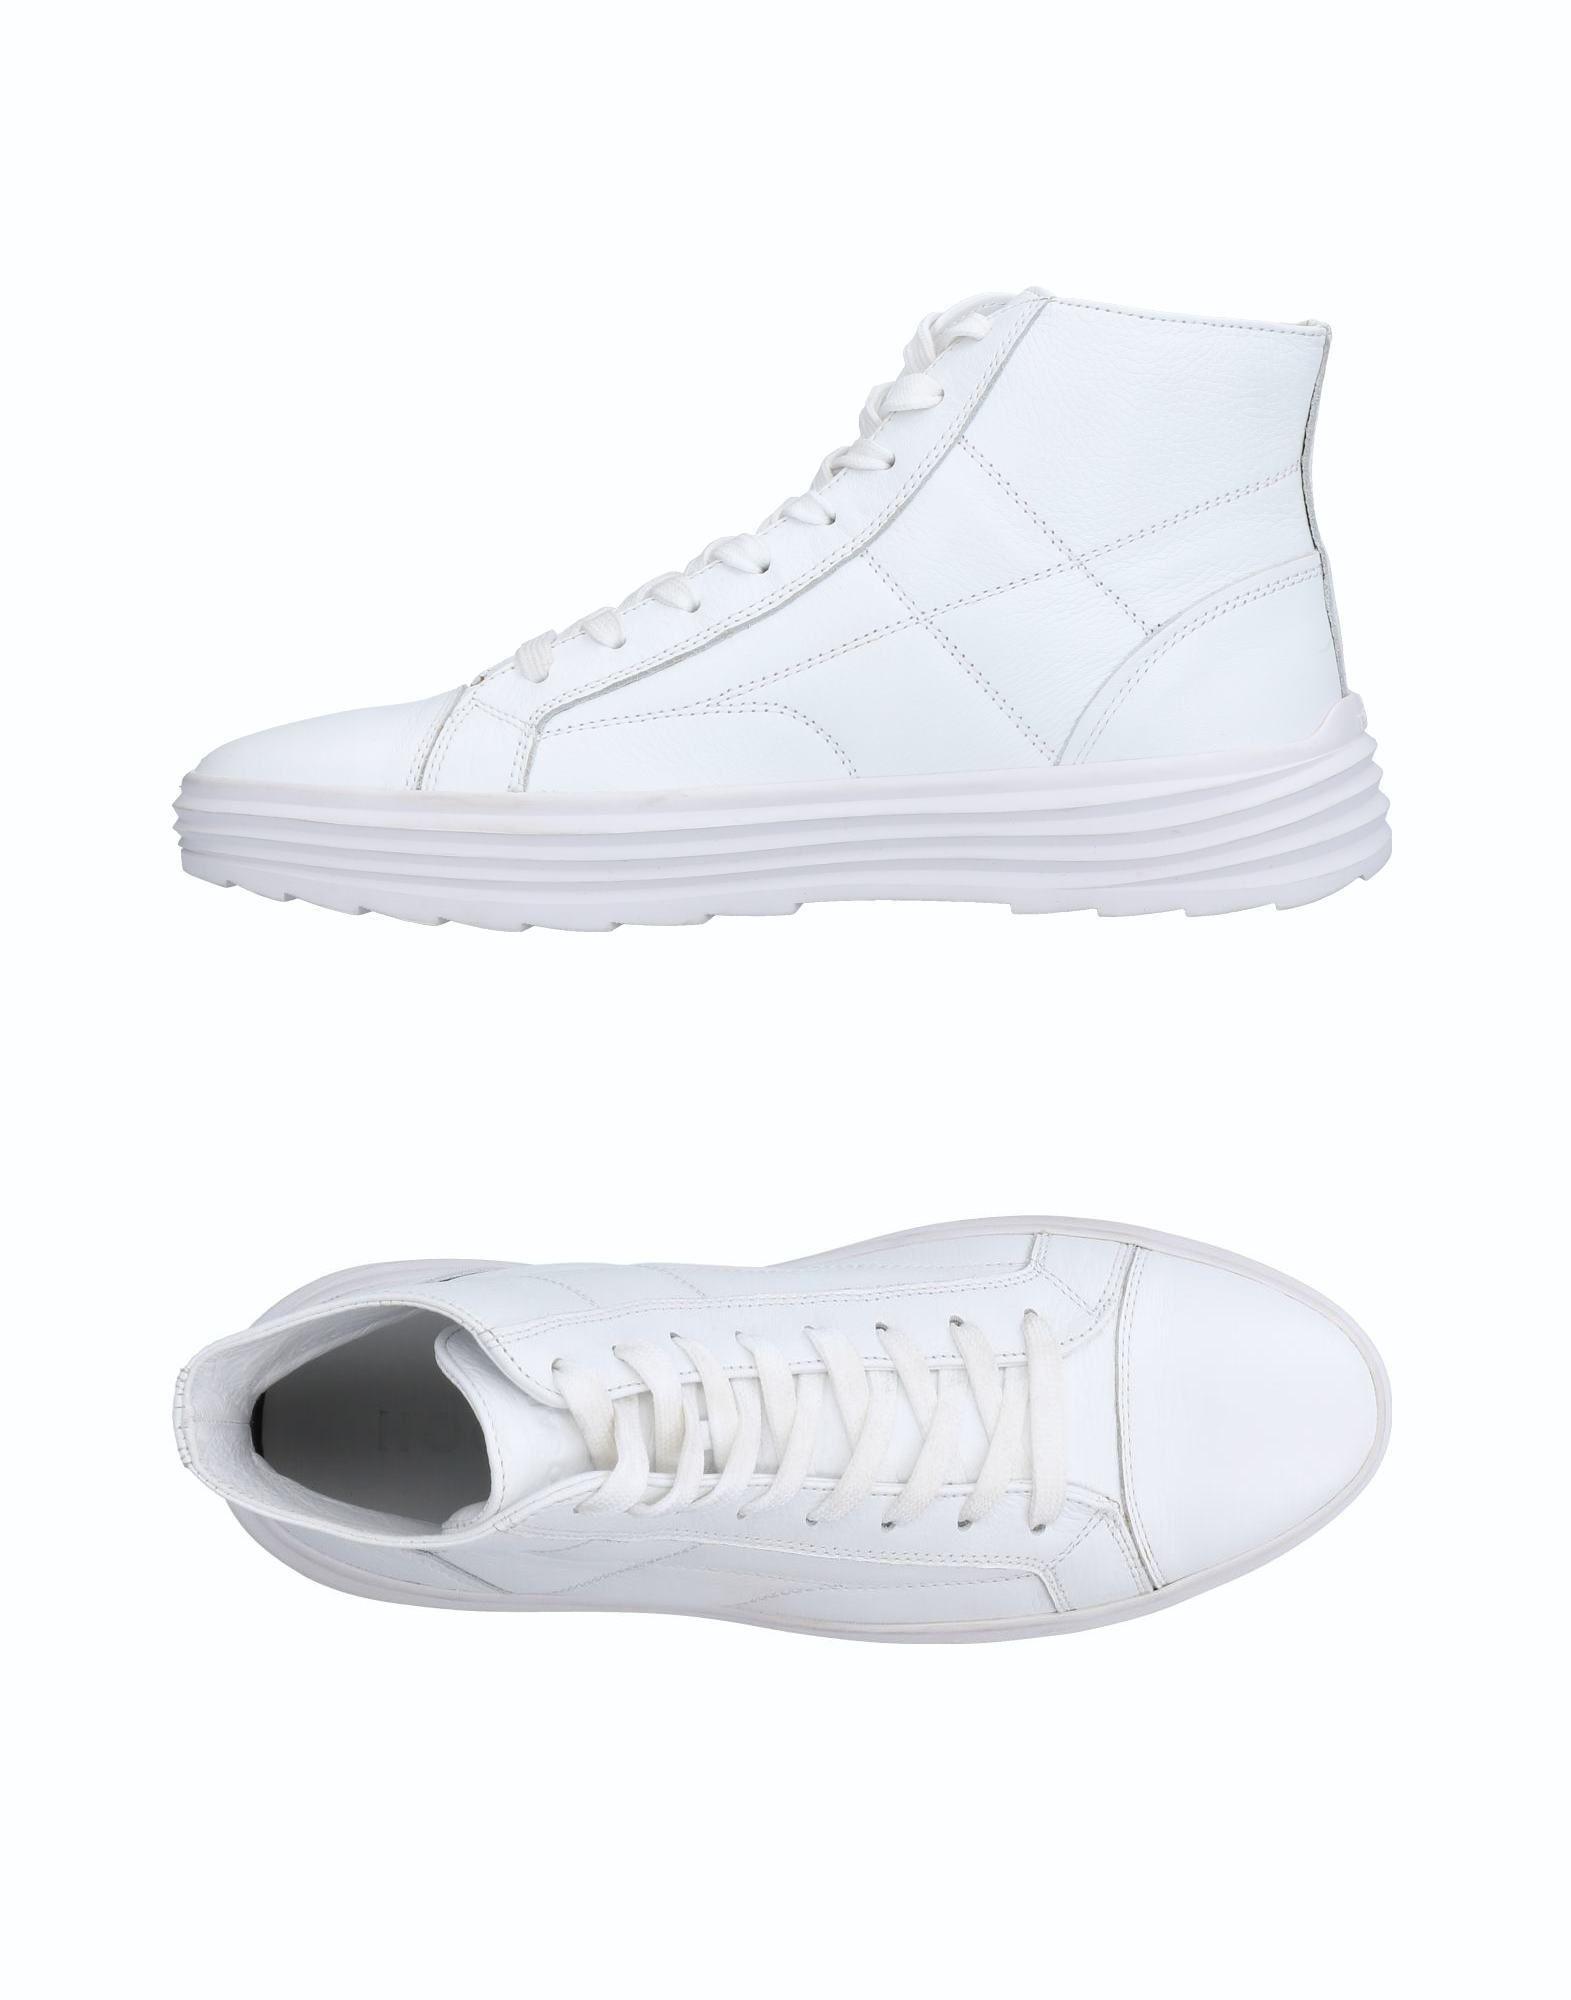 6bd9554b4c99 Lyst - Hogan High-tops   Sneakers in White